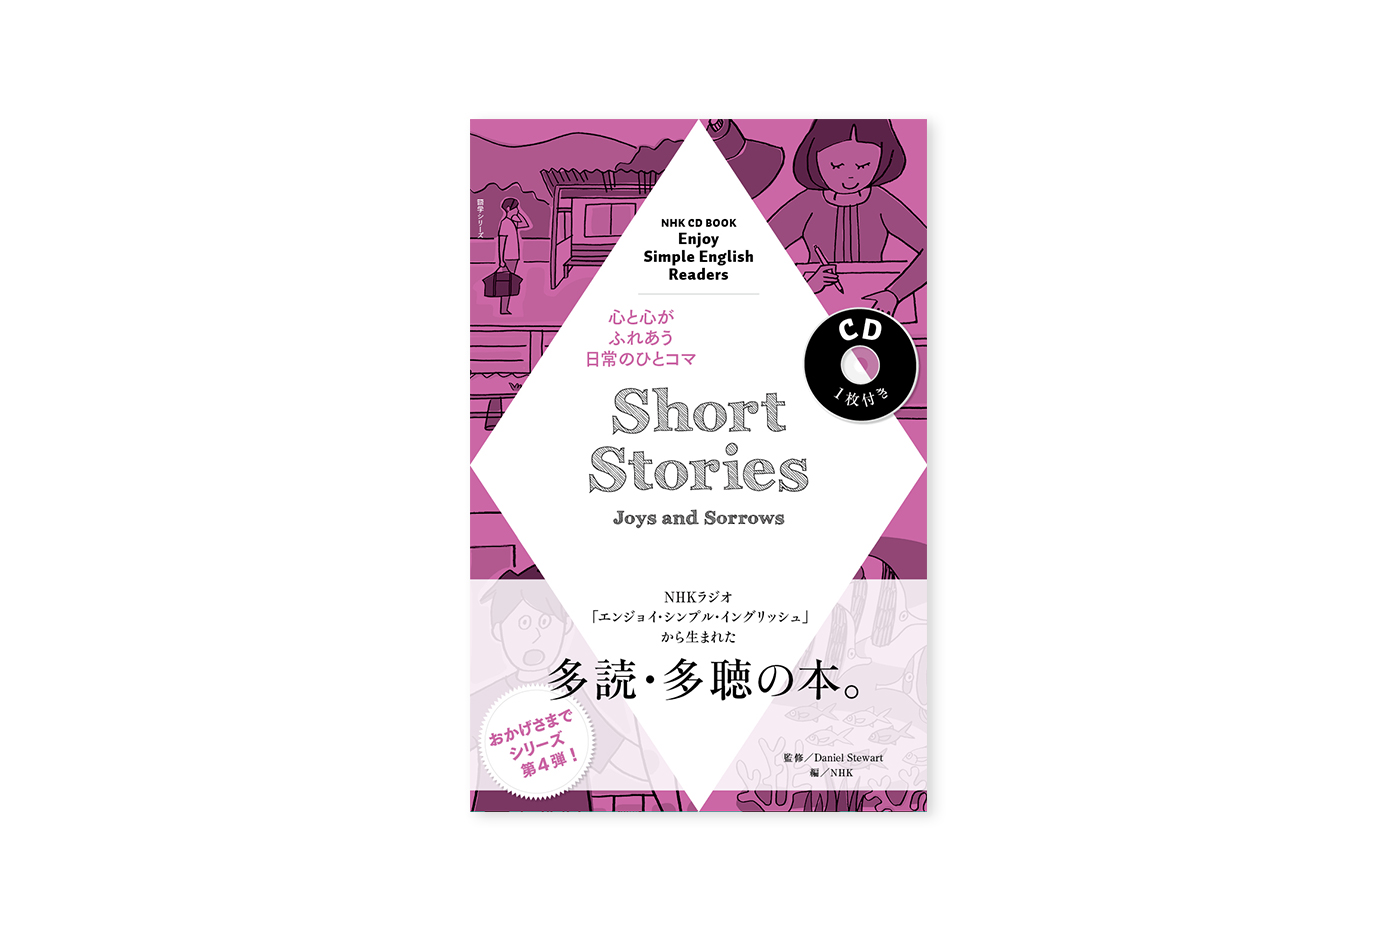 shortstories_hyoushi_right